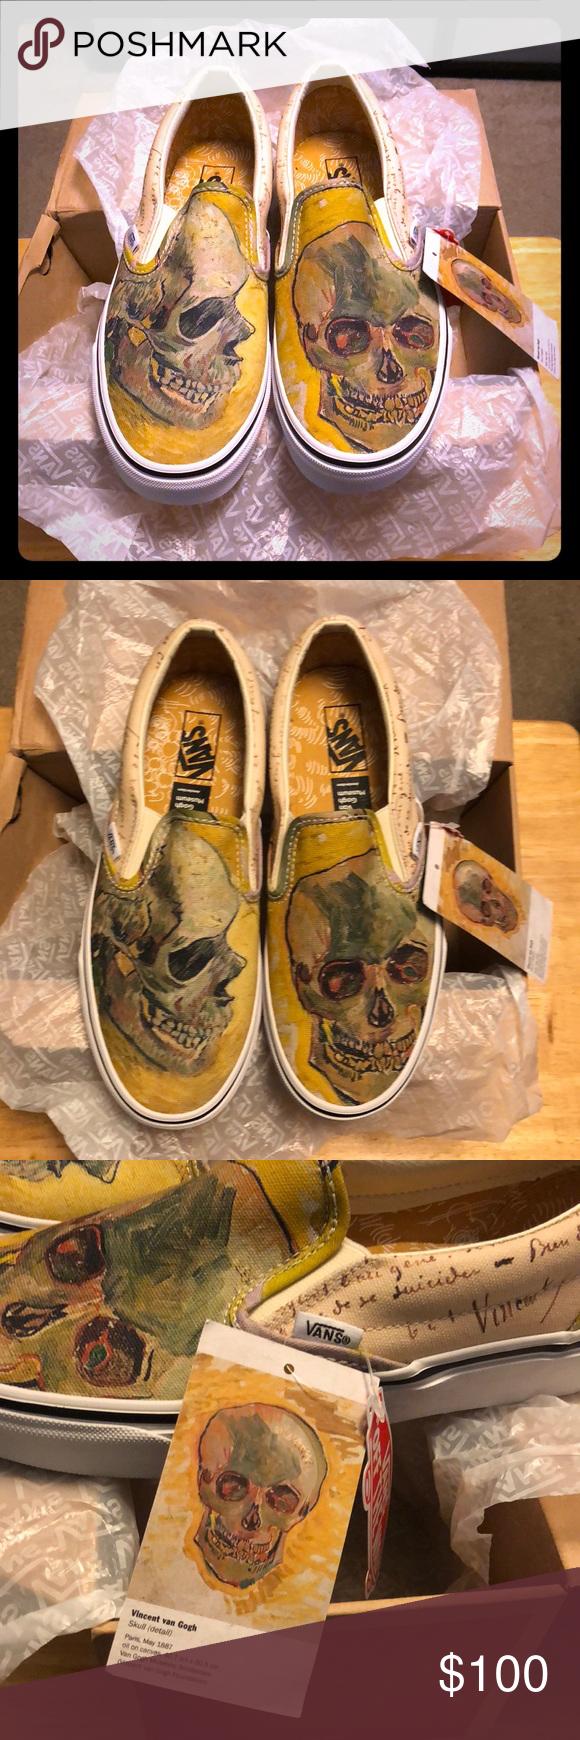 NWT Vans x Vincent Van Gogh Brand new with tags Vans x Vincent Van Gogh  Skull 3f8a353dd